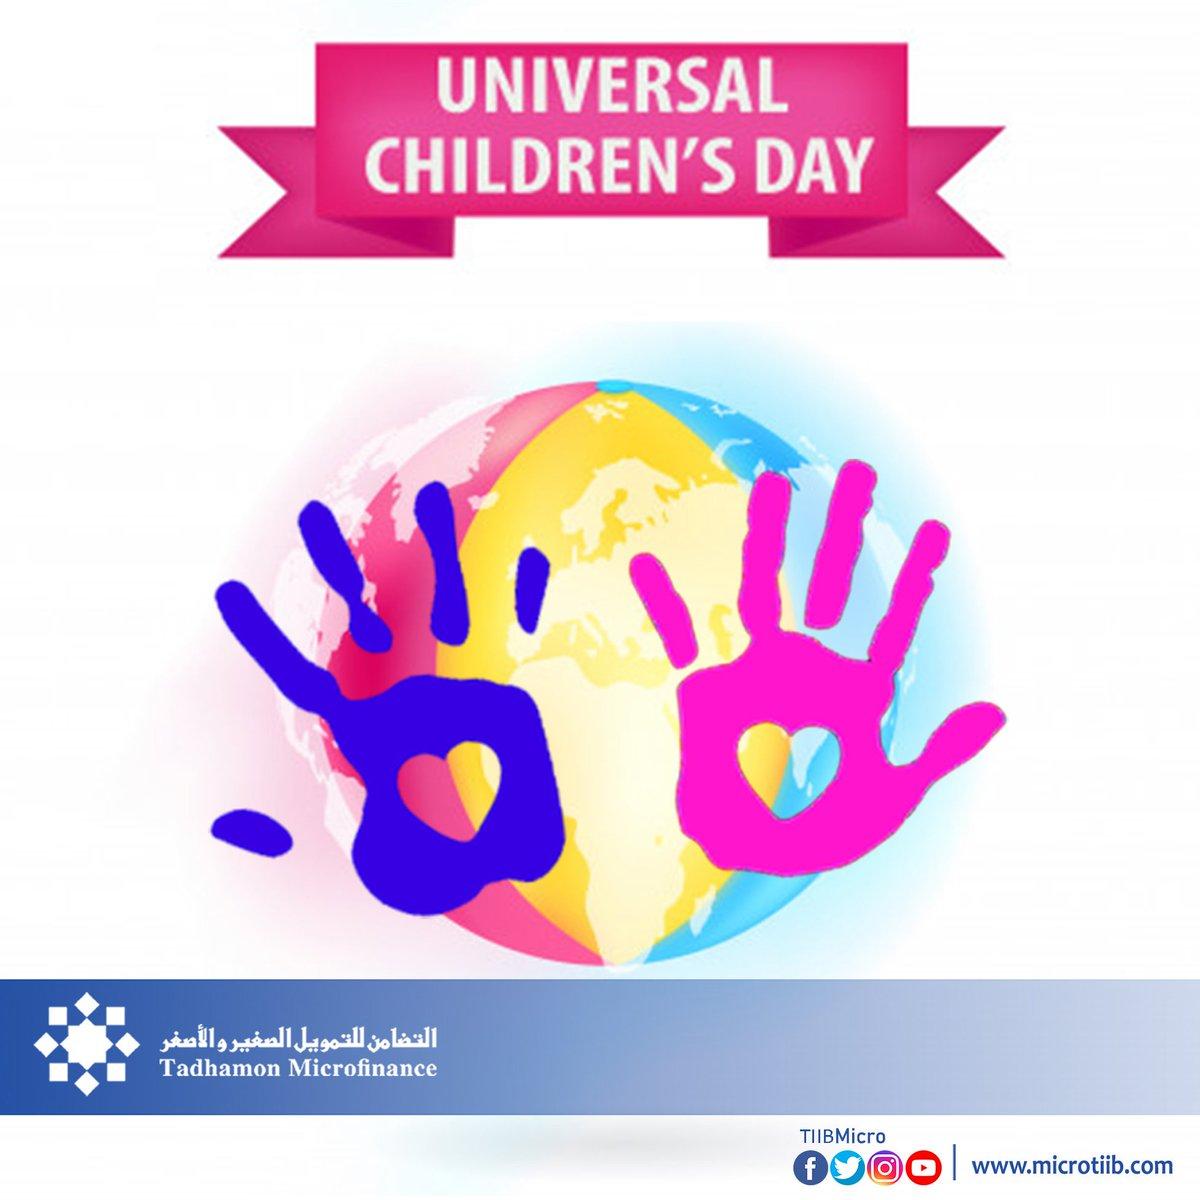 ecua universal childrens day - HD1200×1200